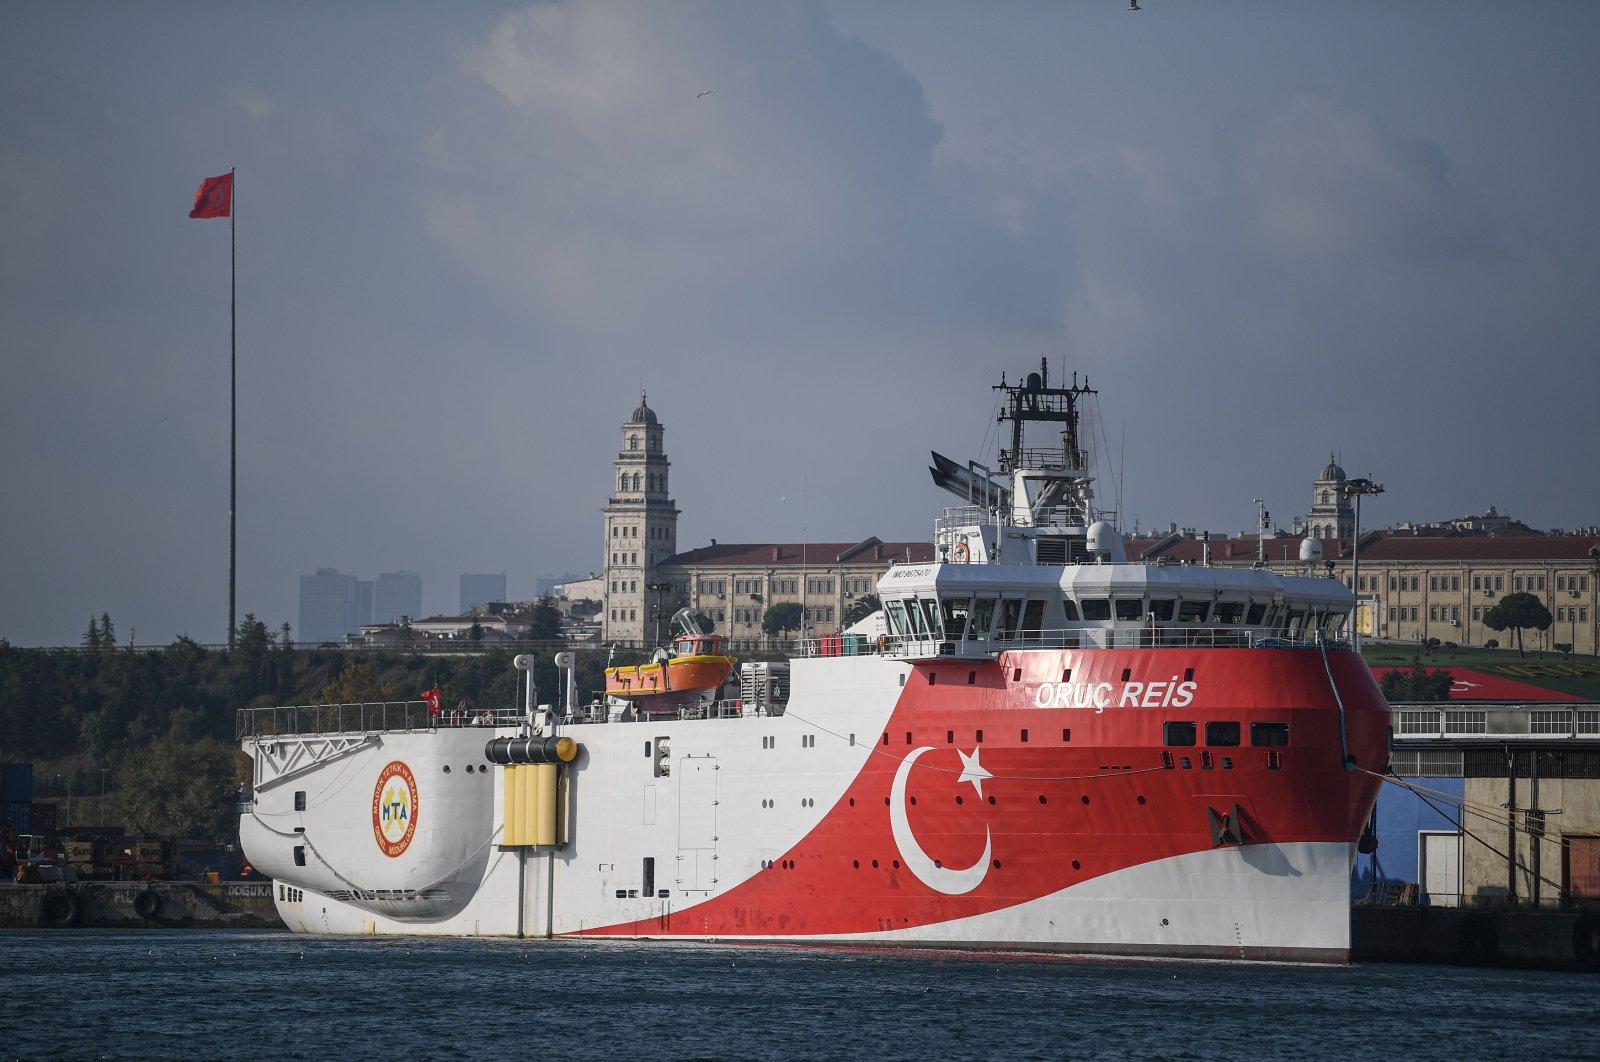 The Oruç Reis seismic research vessel docked at Haydarpaşa Port in Istanbul, Turkey, Aug. 23, 2019. (AFP Photo)